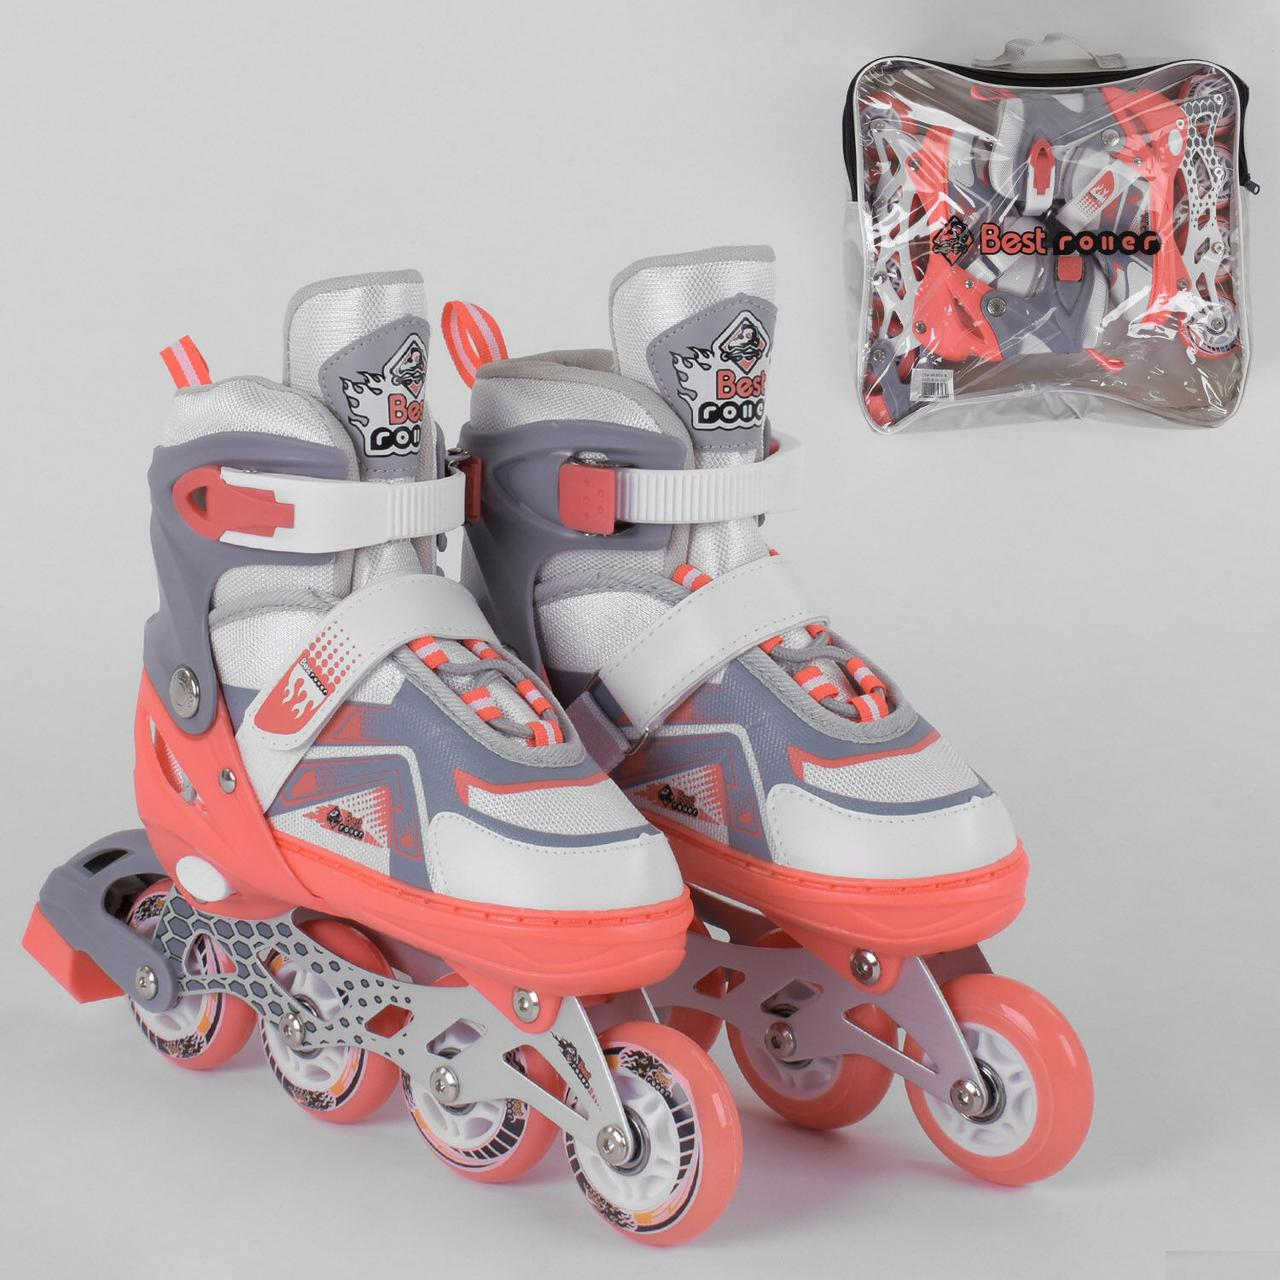 Ролики Best Rollers (РОЗОВЫЕ) размер S /30-33/ колёса PU арт. 1077